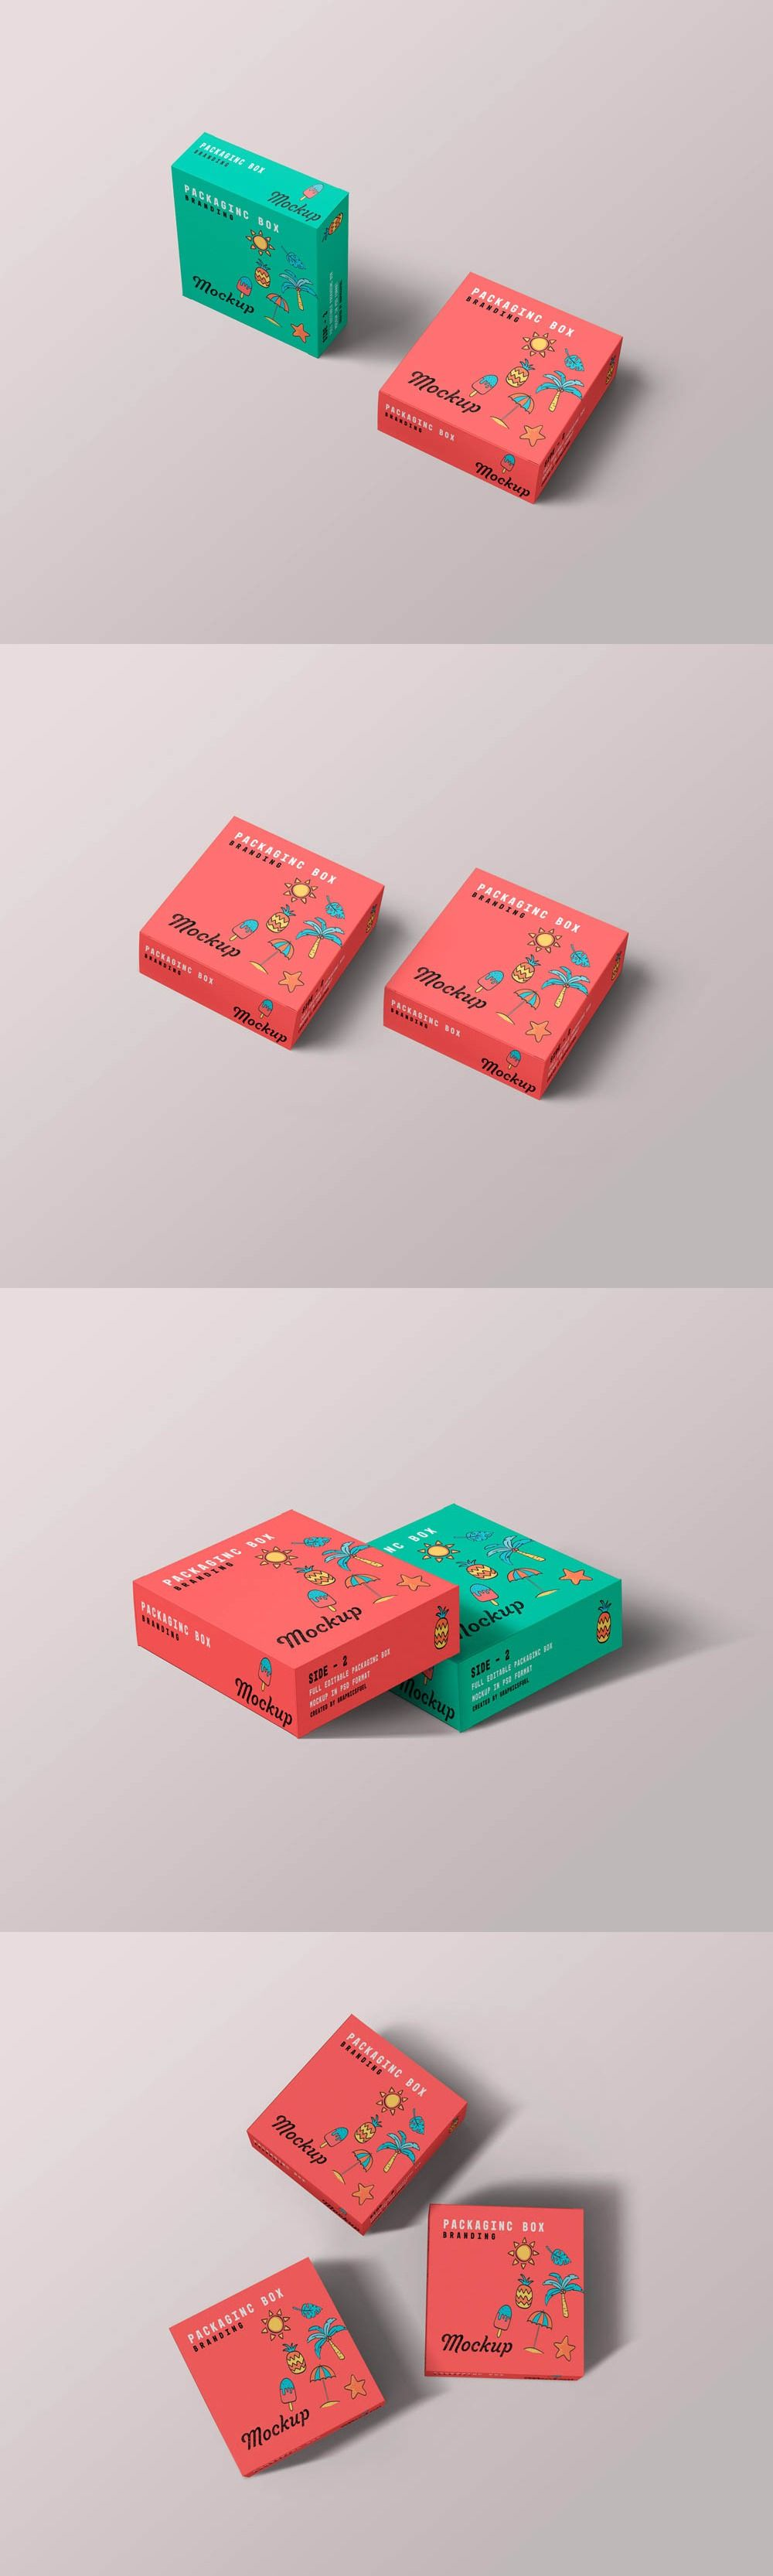 Download Square Packaging Box Mockups Graphicsfuel Box Mockup Packaging Template Box Packaging